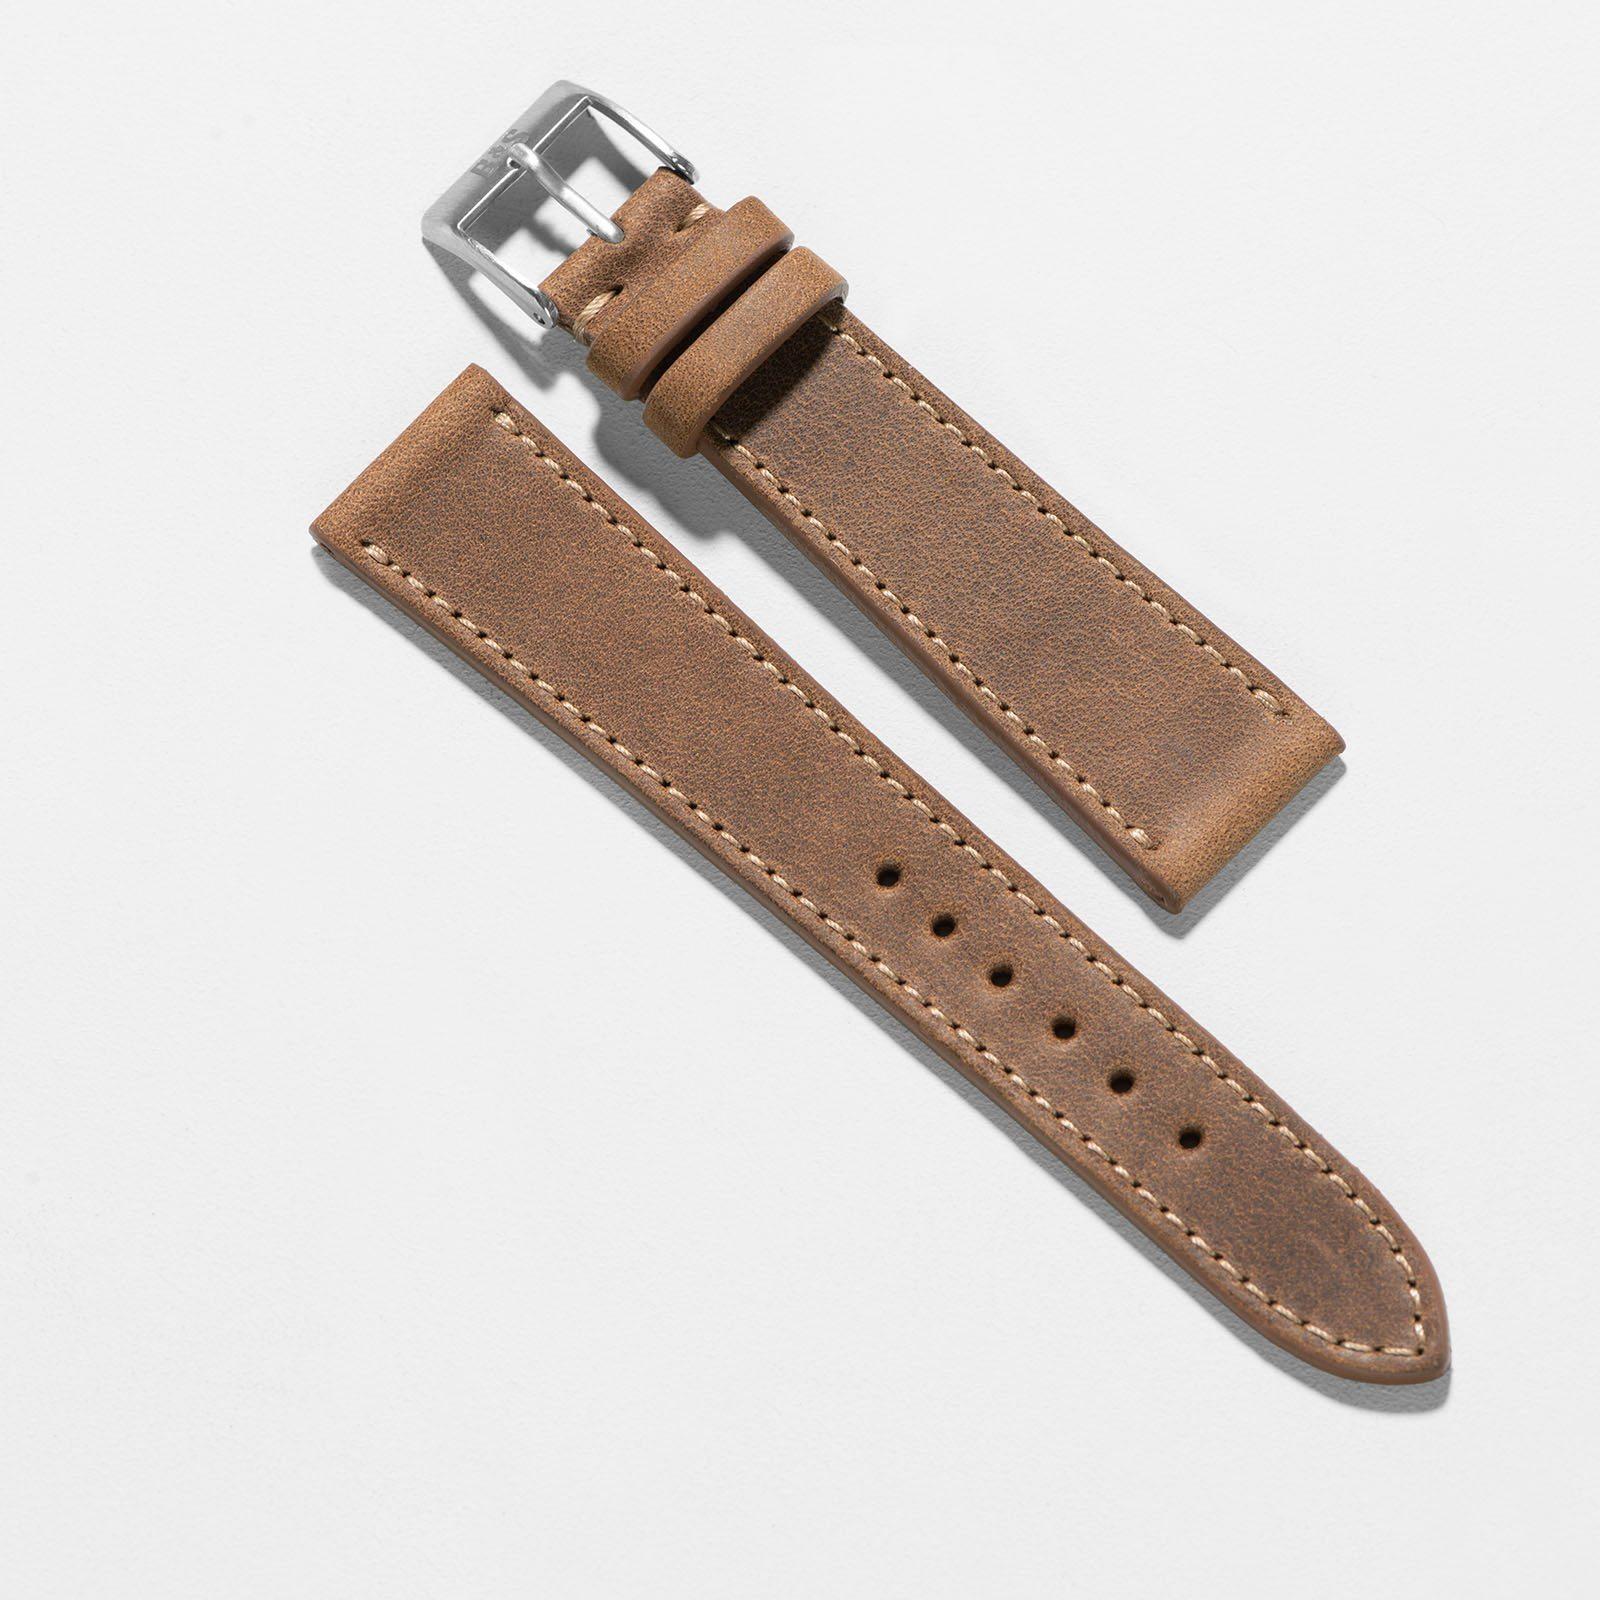 Cinnamon_Brown_Leather_Watch_Strap_02_2048x2048.jpg